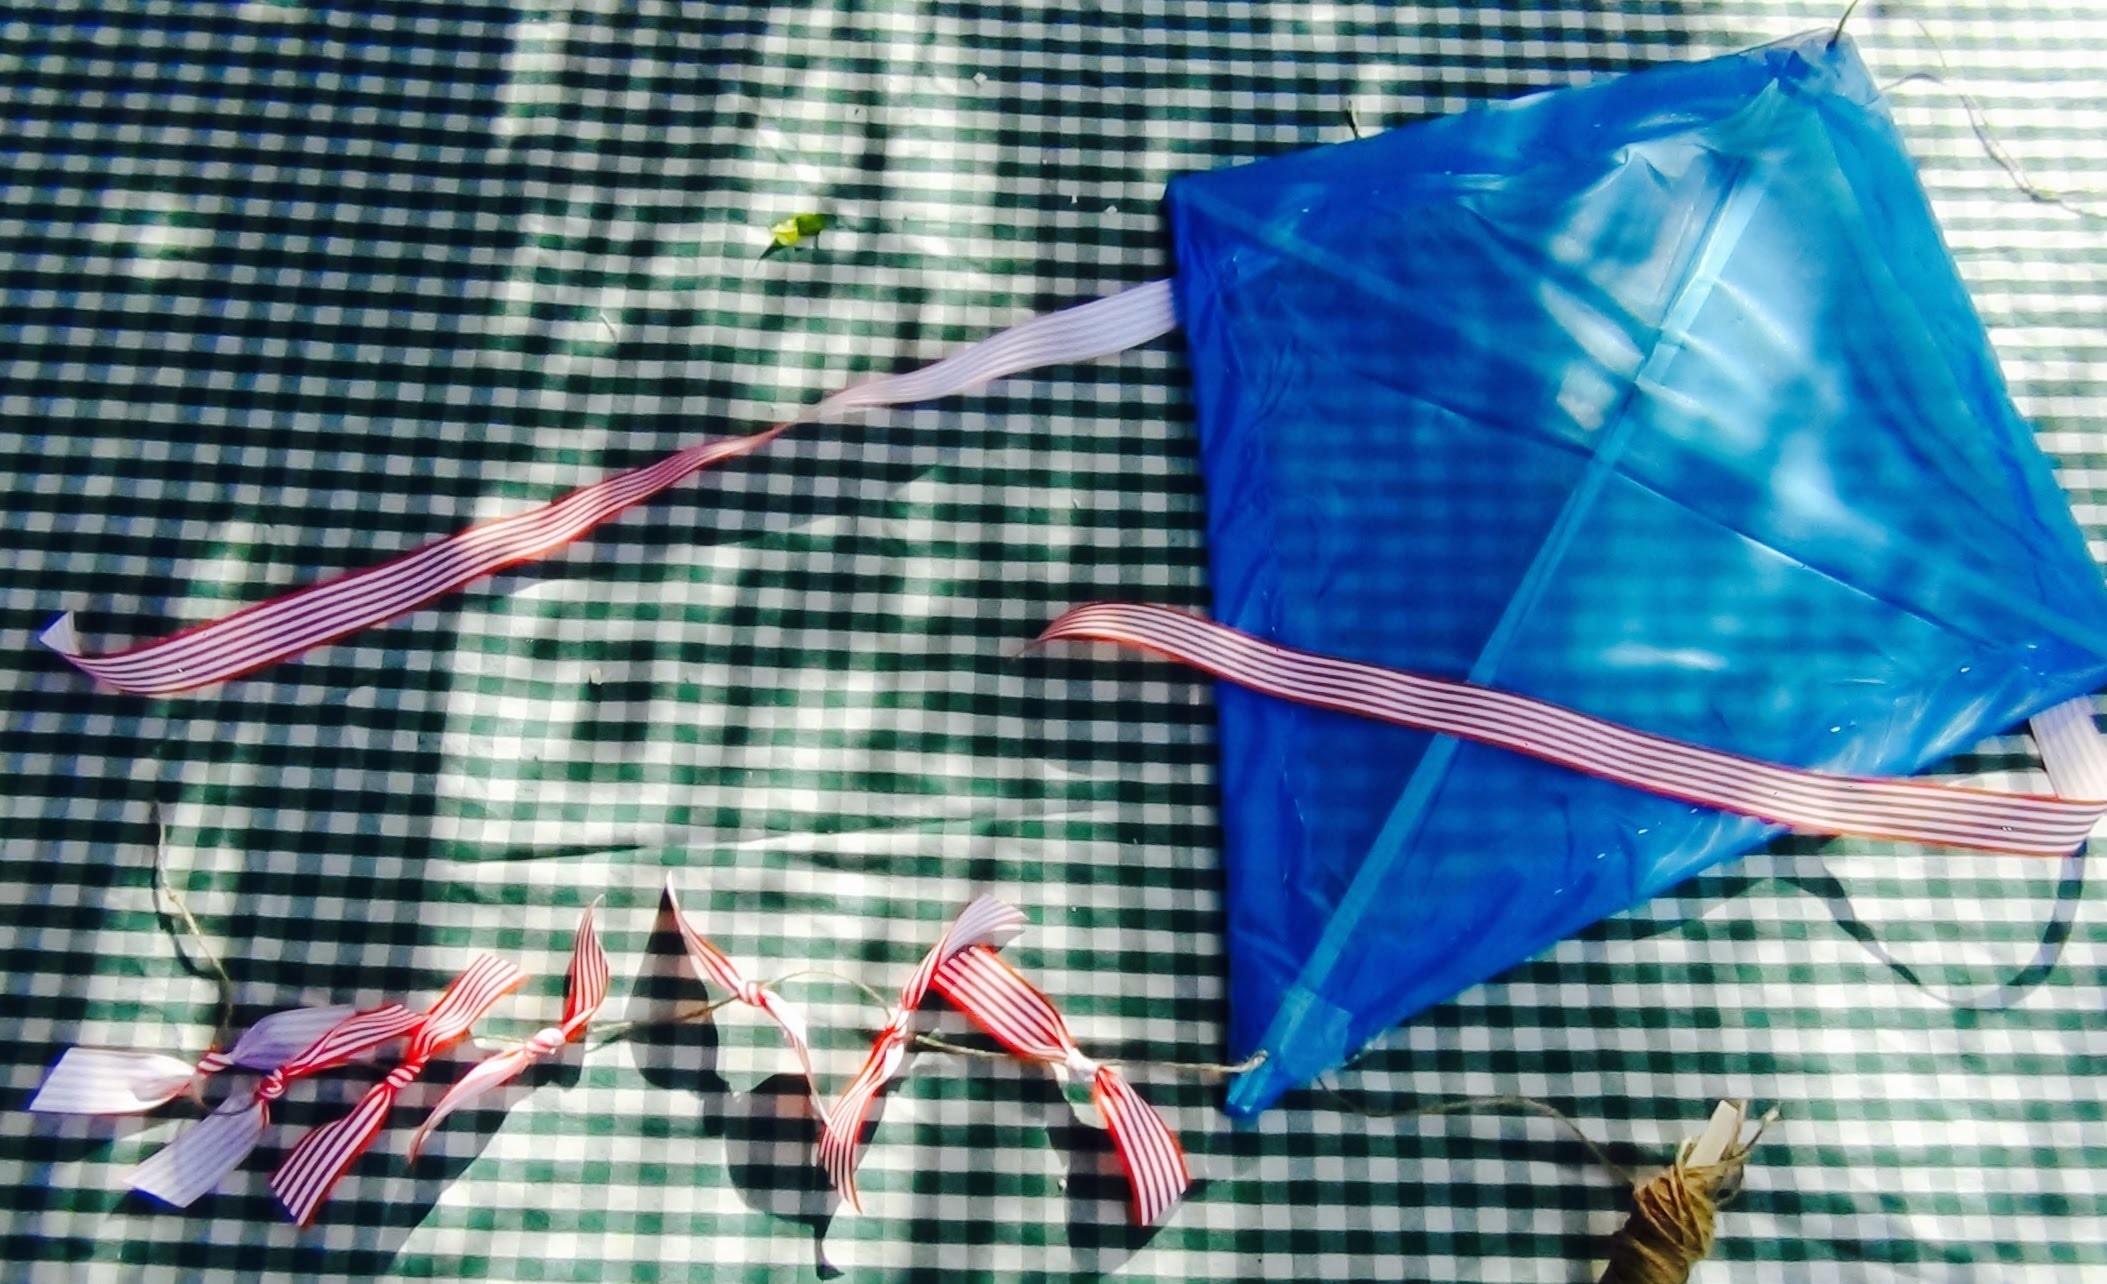 Kite flying: How to make a homemade kite